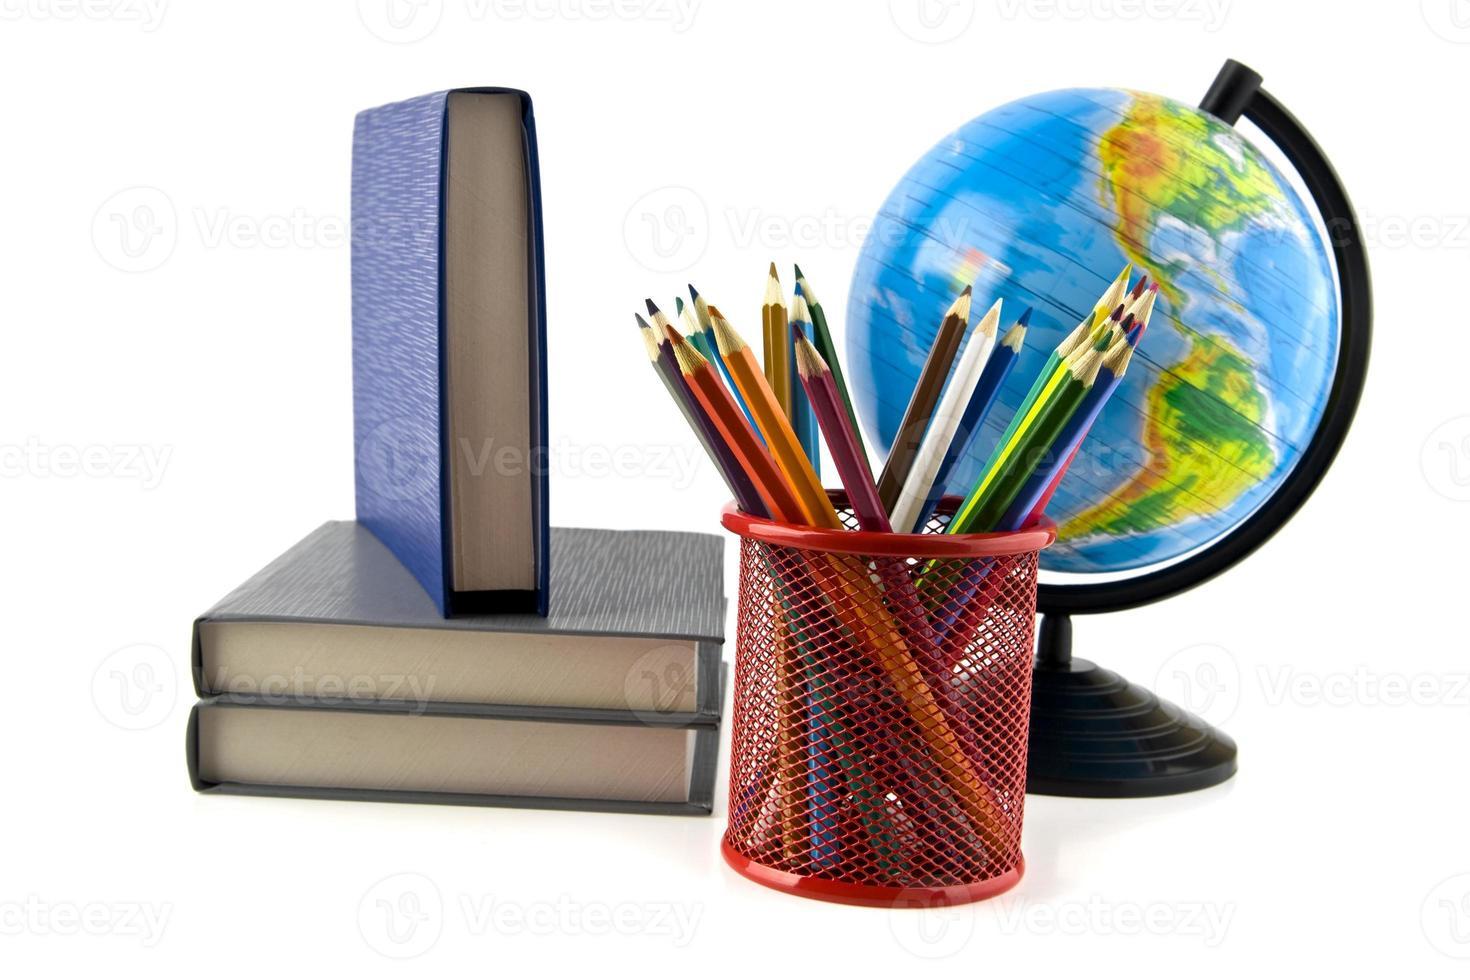 boeken, potloden en wereldbol foto